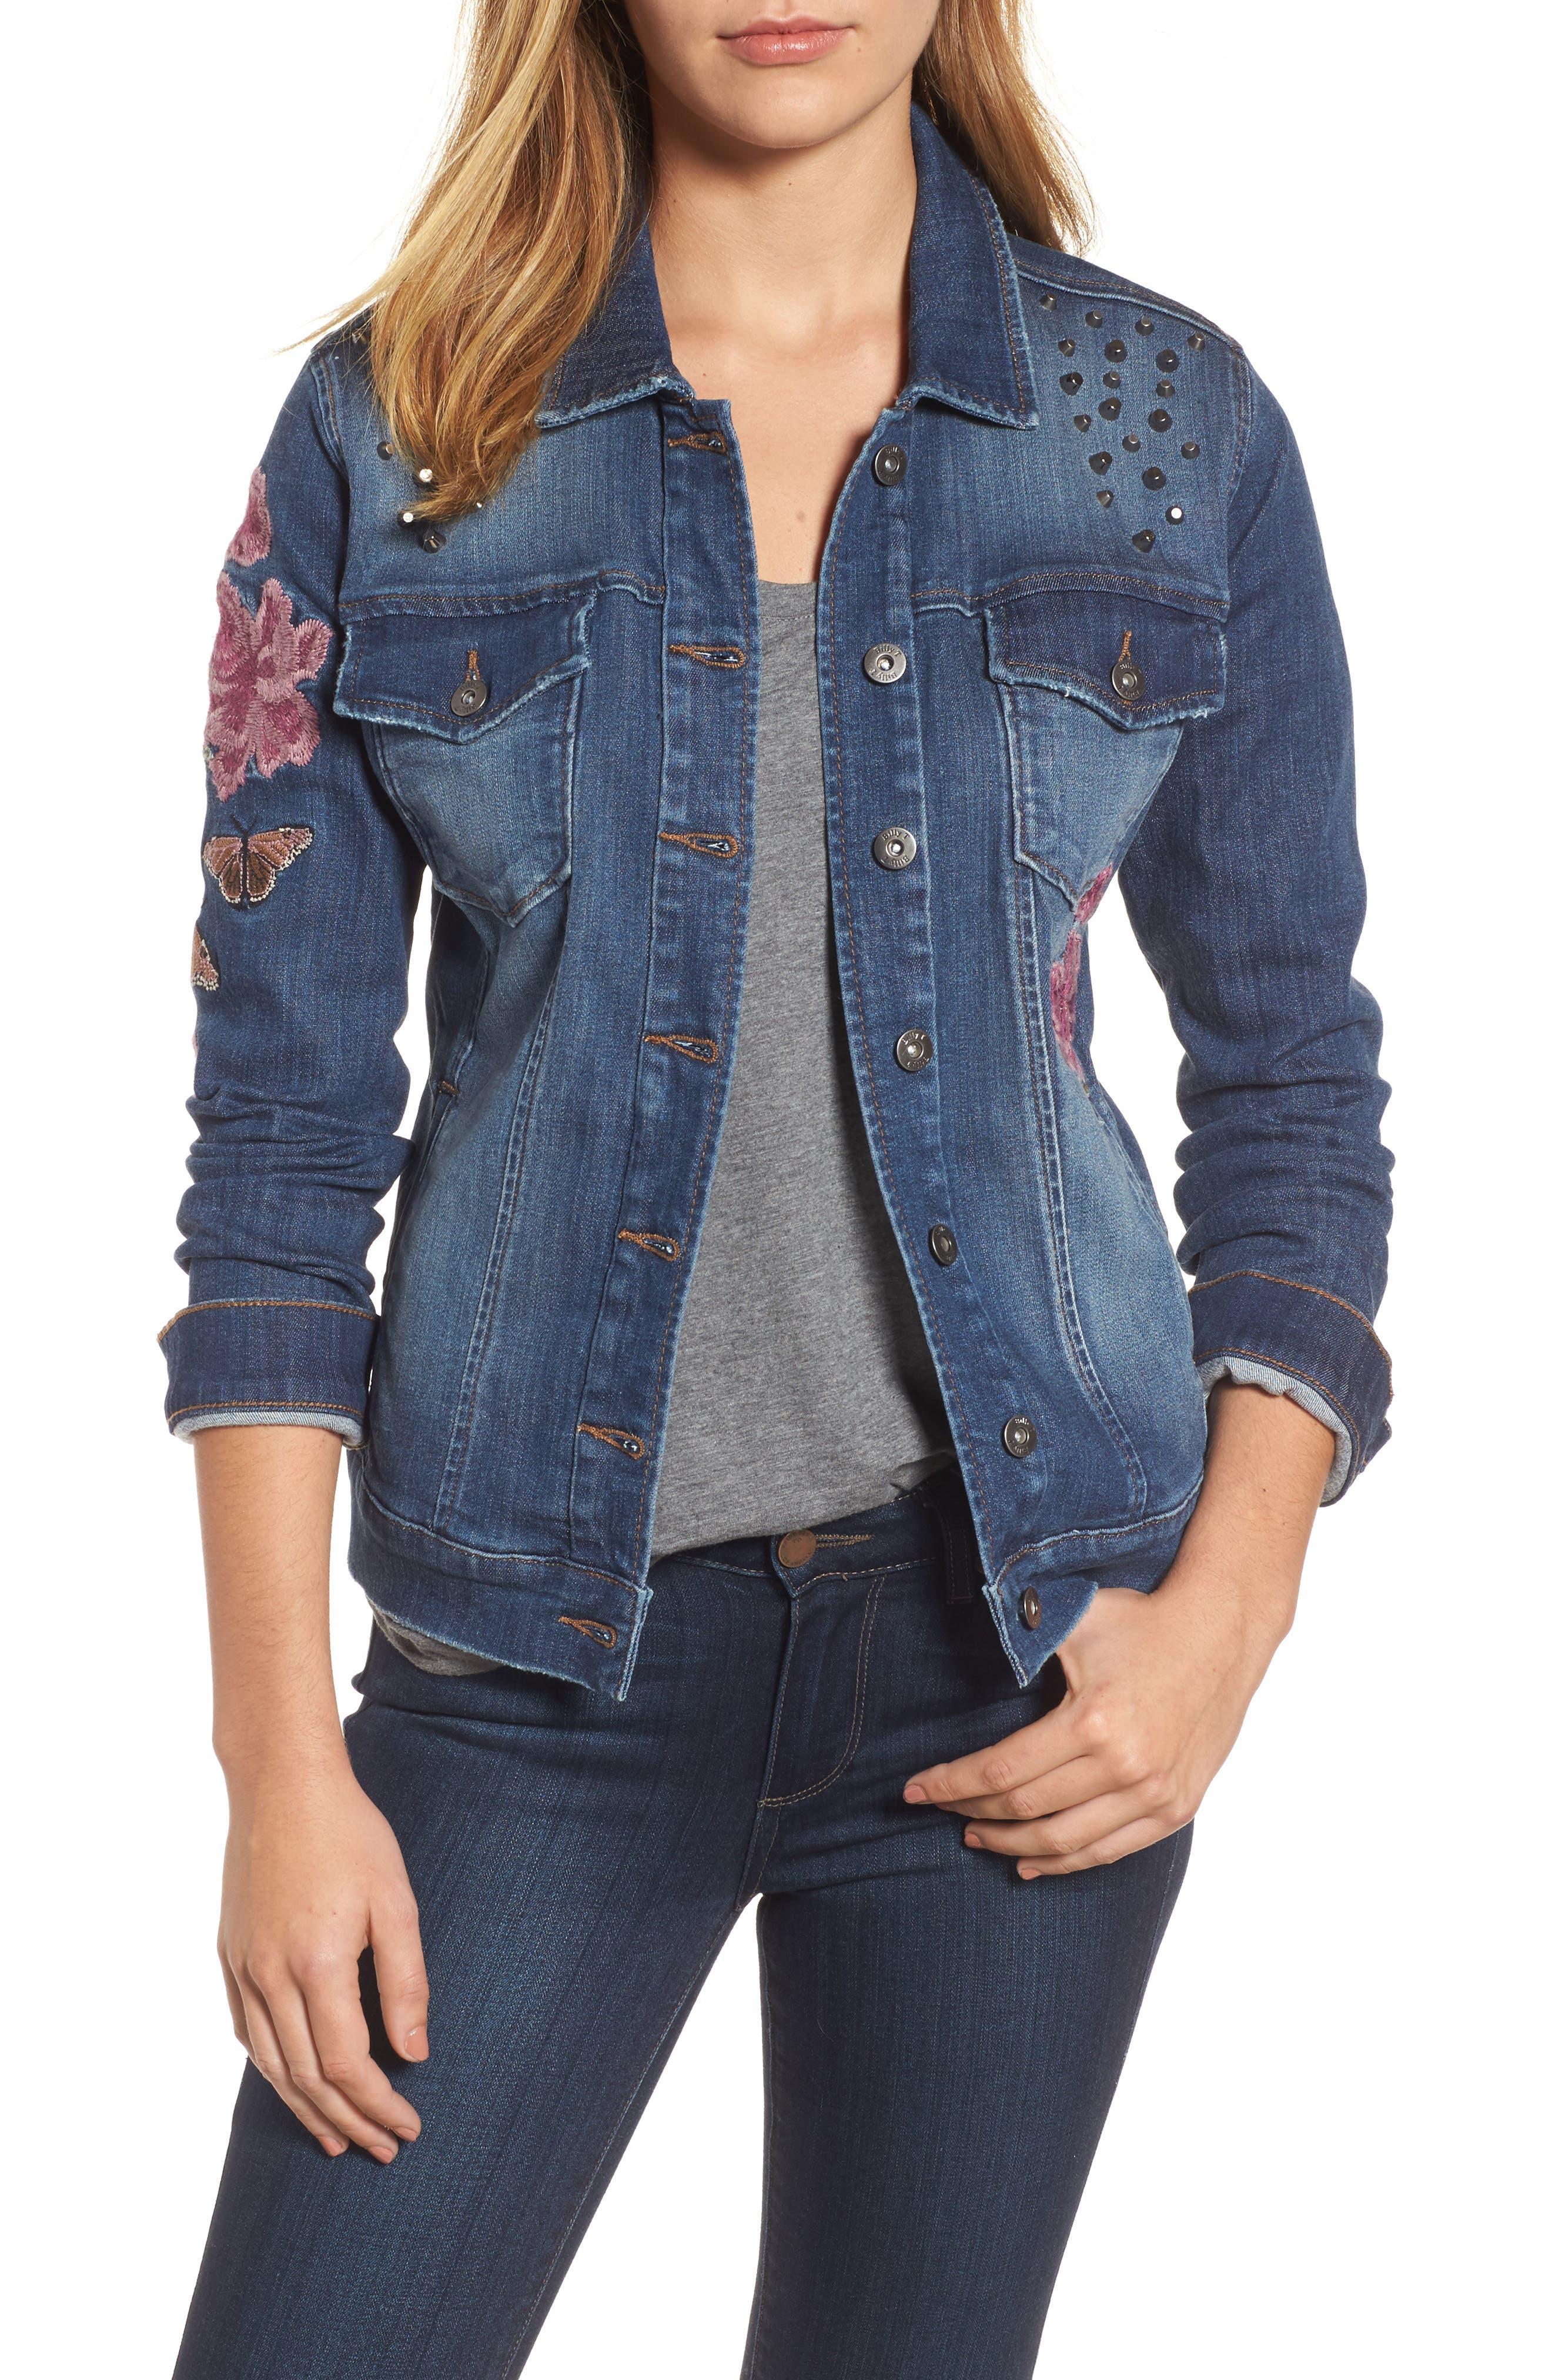 Alternate Image 1 Selected - Billy T Embroidered Denim Jacket